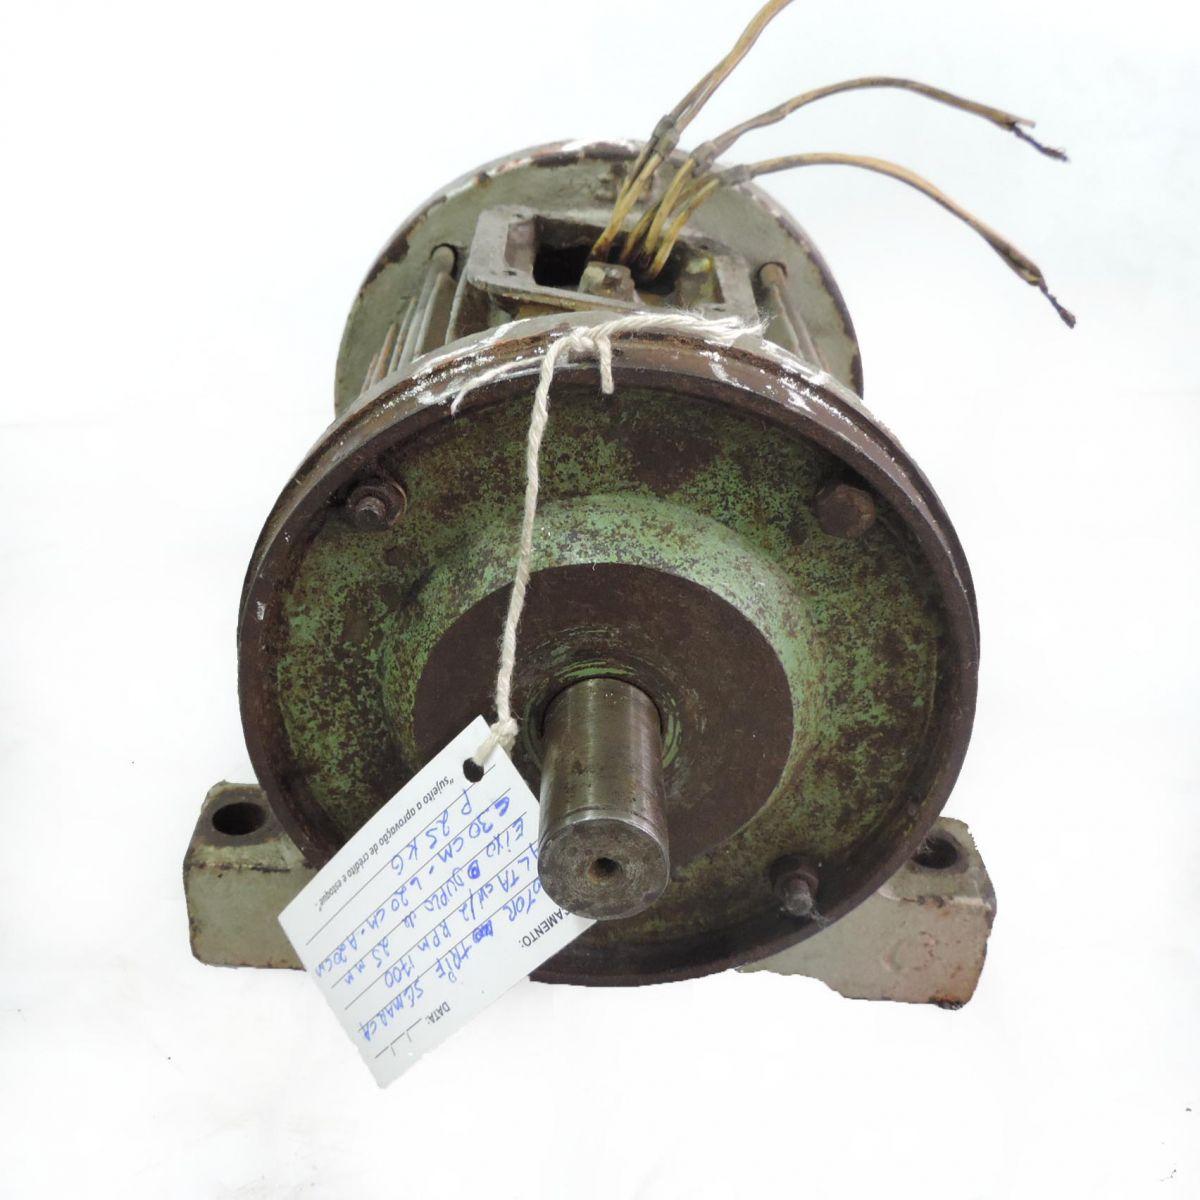 Motor trif sico f26 0 5 cv 1700 rpm vega m quinas for Motor piscina 0 5 cv